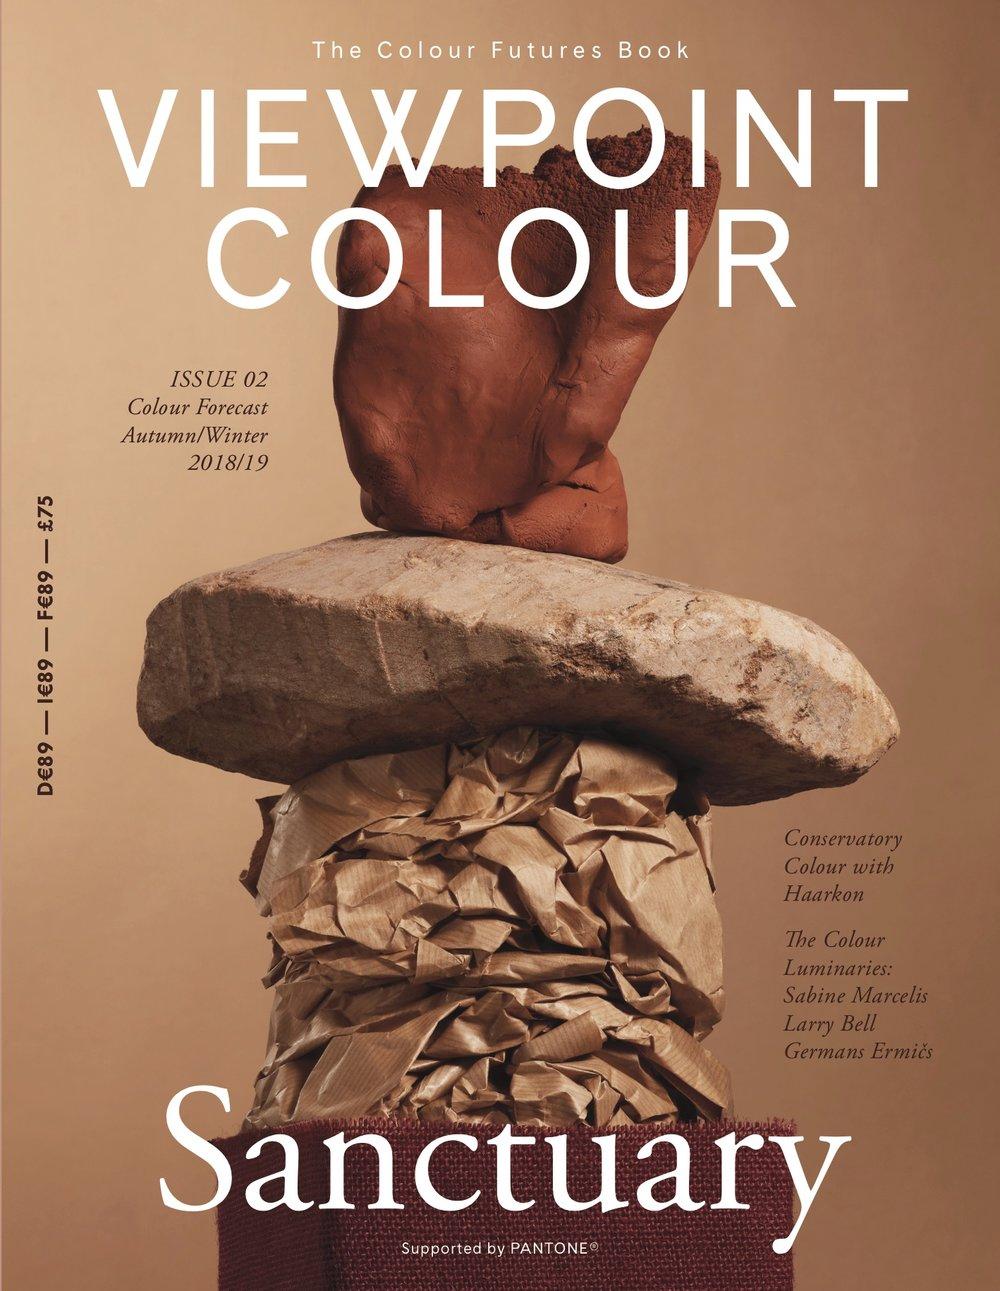 The Colour Futures Book Autumn/Winter 2018/19